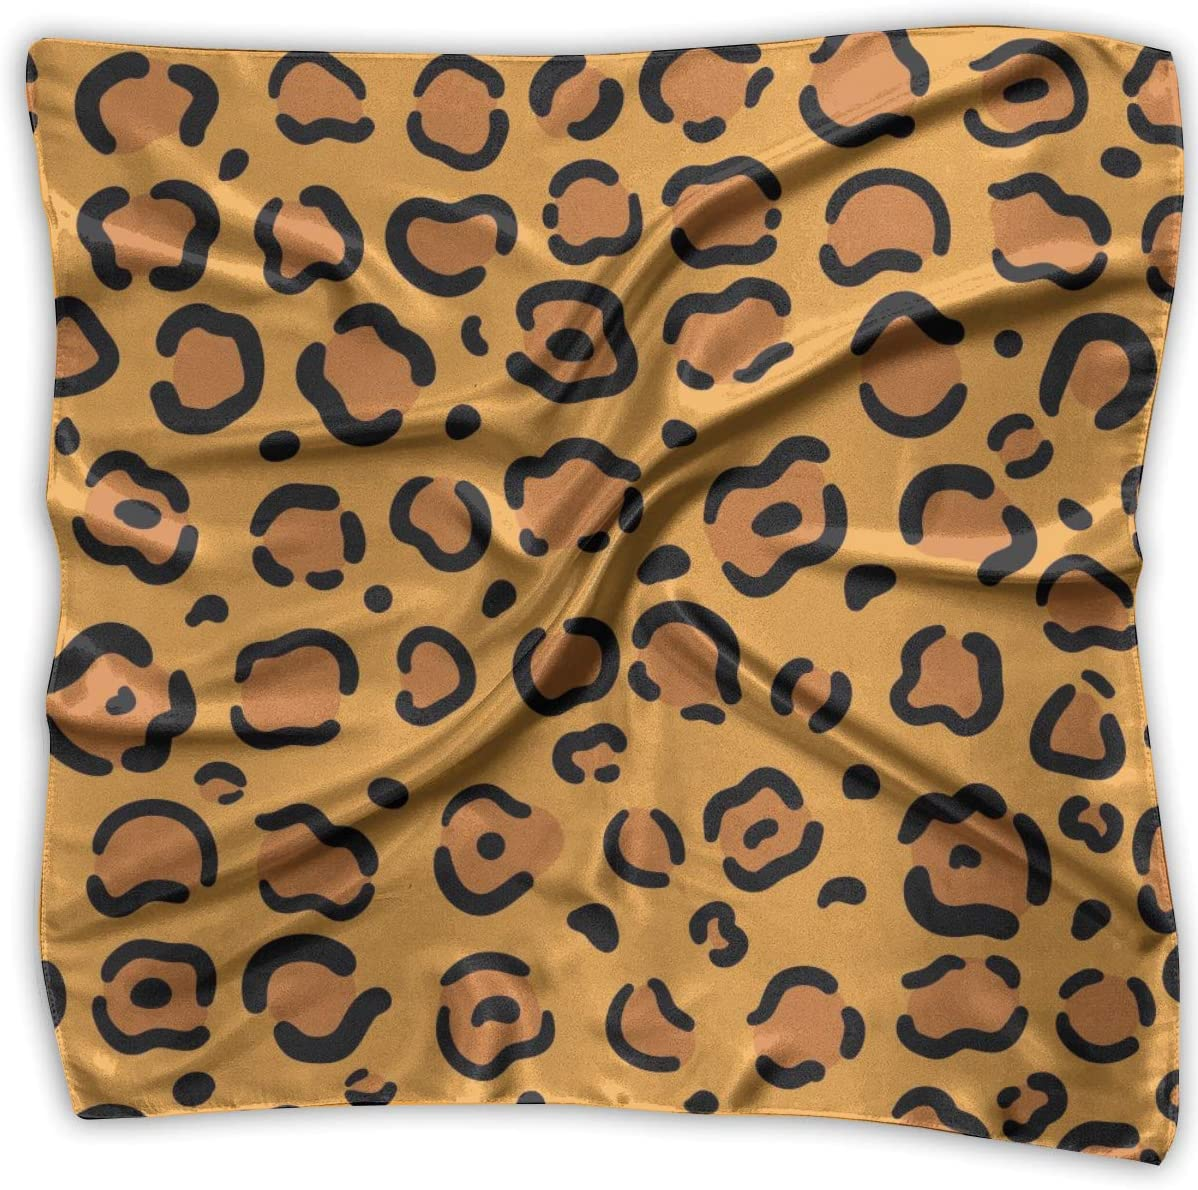 YANGZXC Leopard Yellow Handkerchief Polyester Pocket Square Mulipurpose Silk Bandanas Delicate Printing